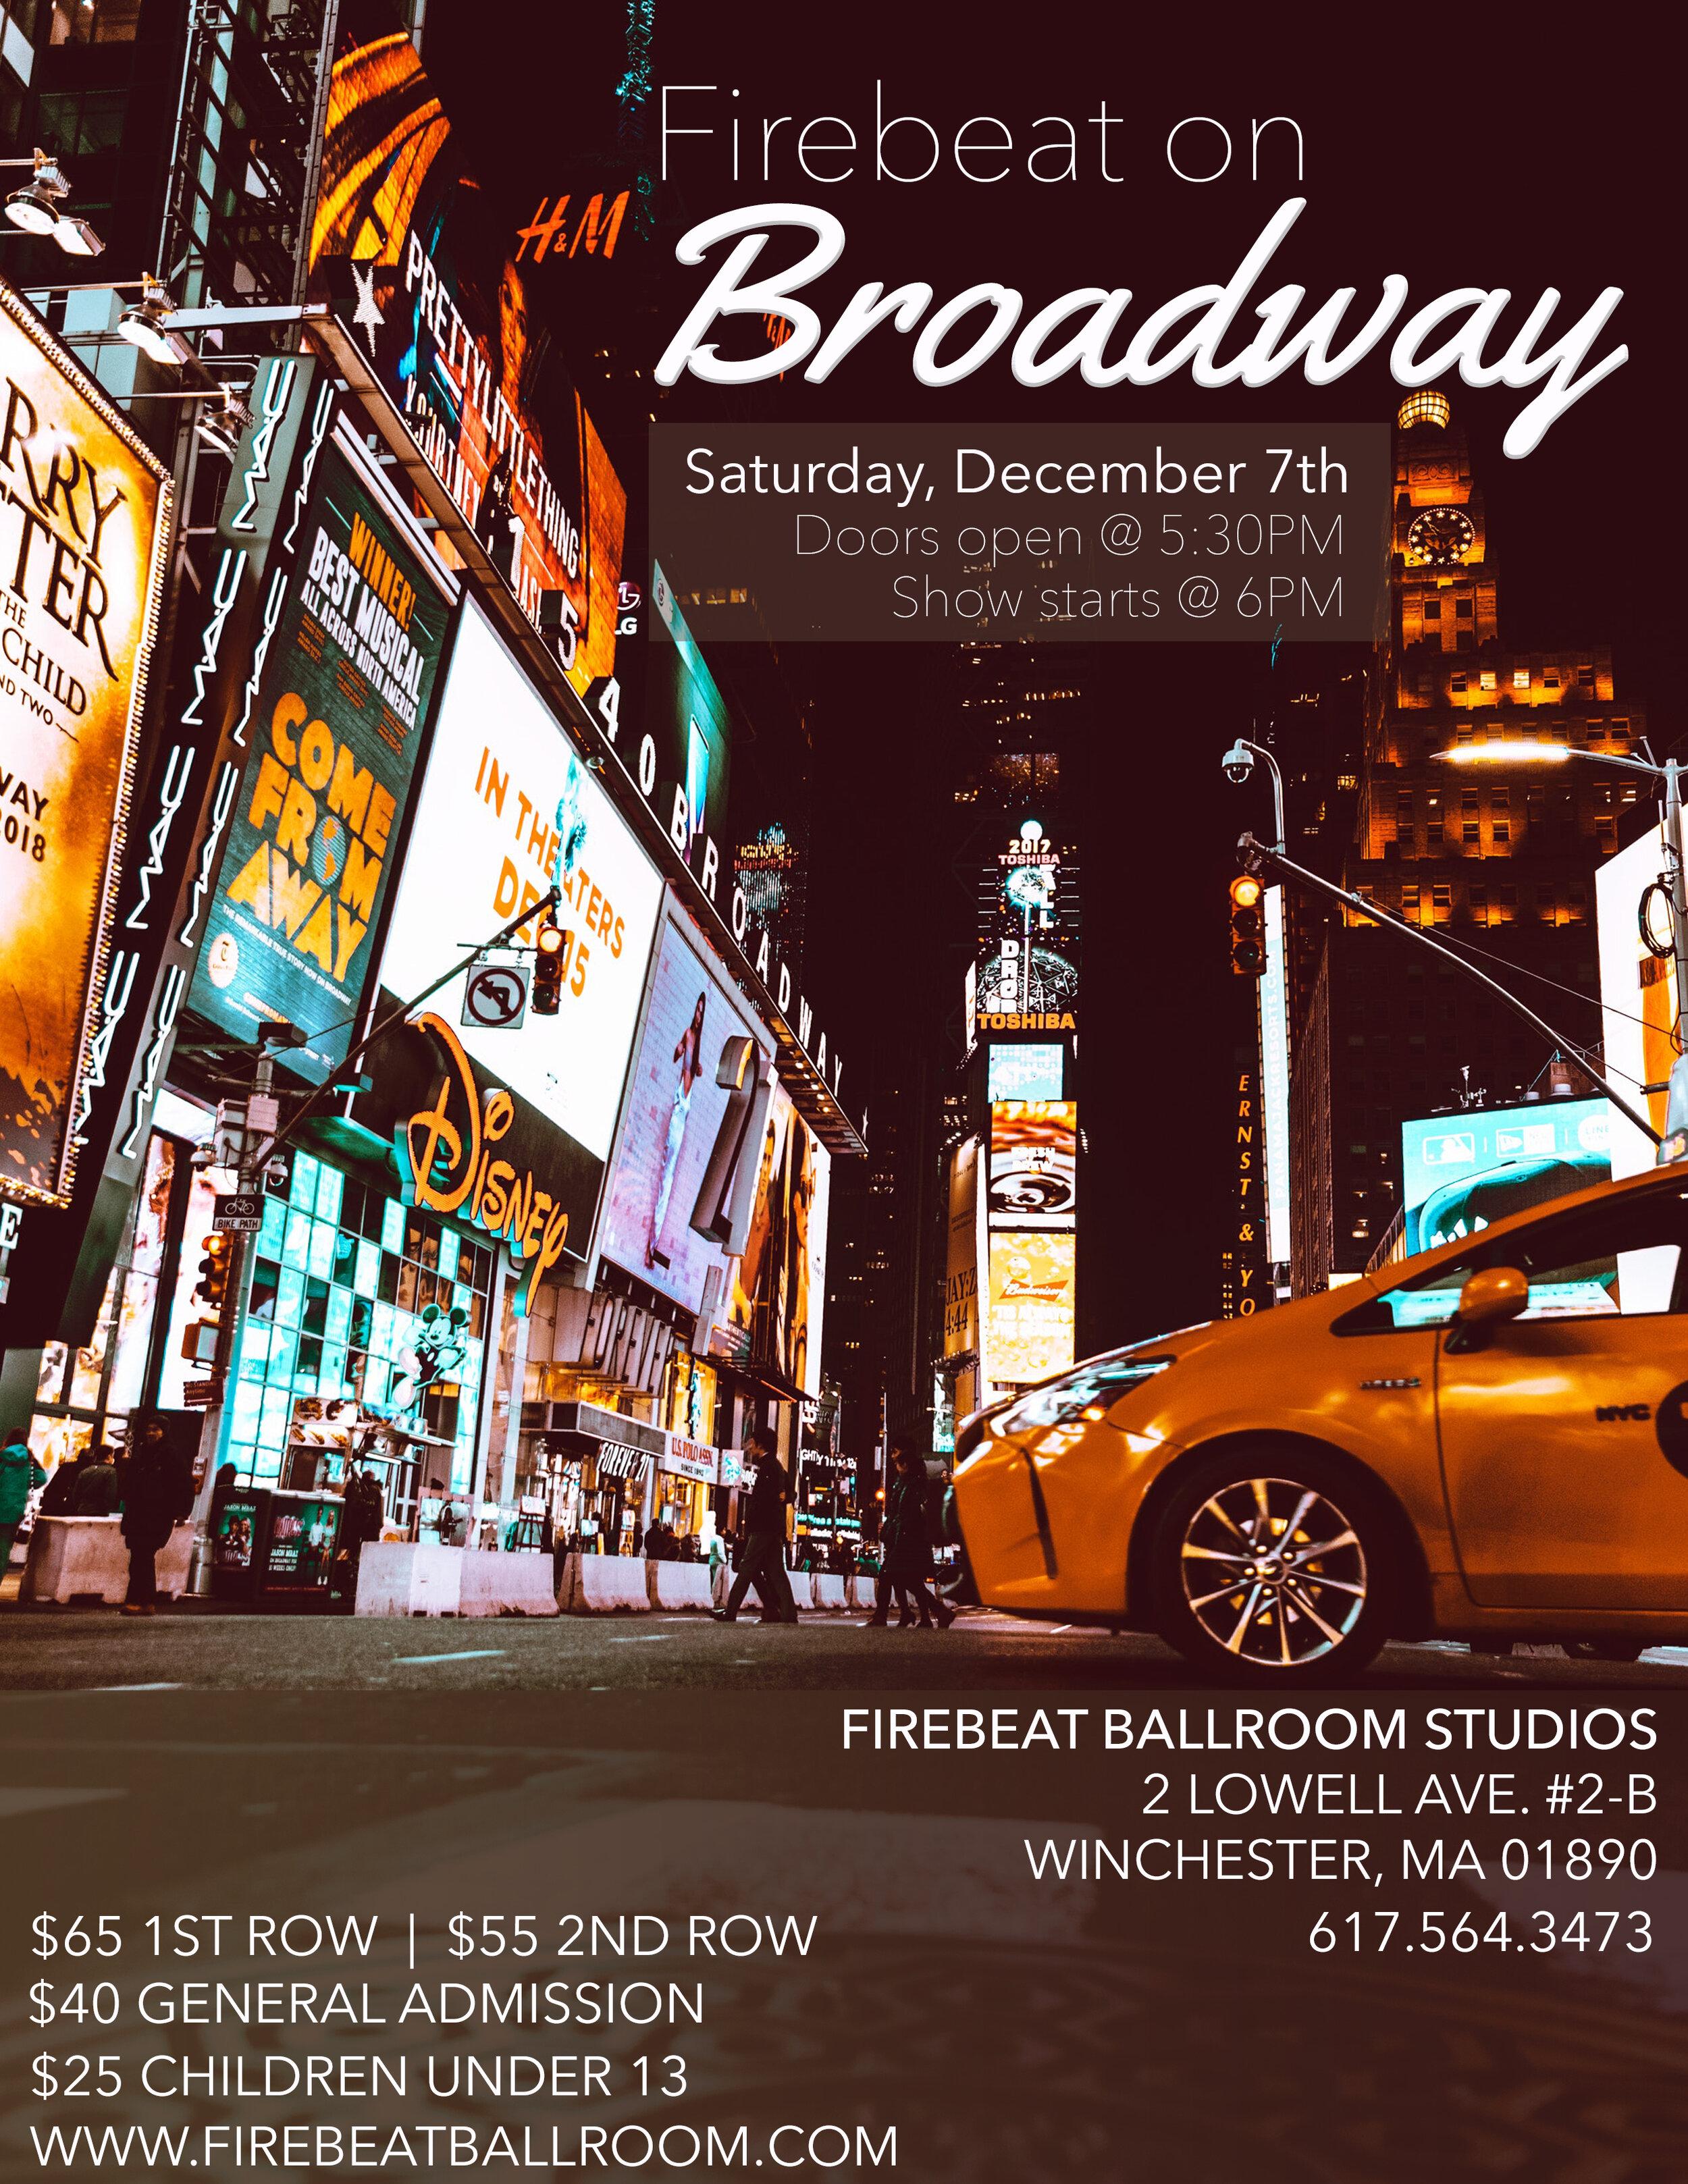 2019_12_ShowcaseFlyer_Broadway.jpg